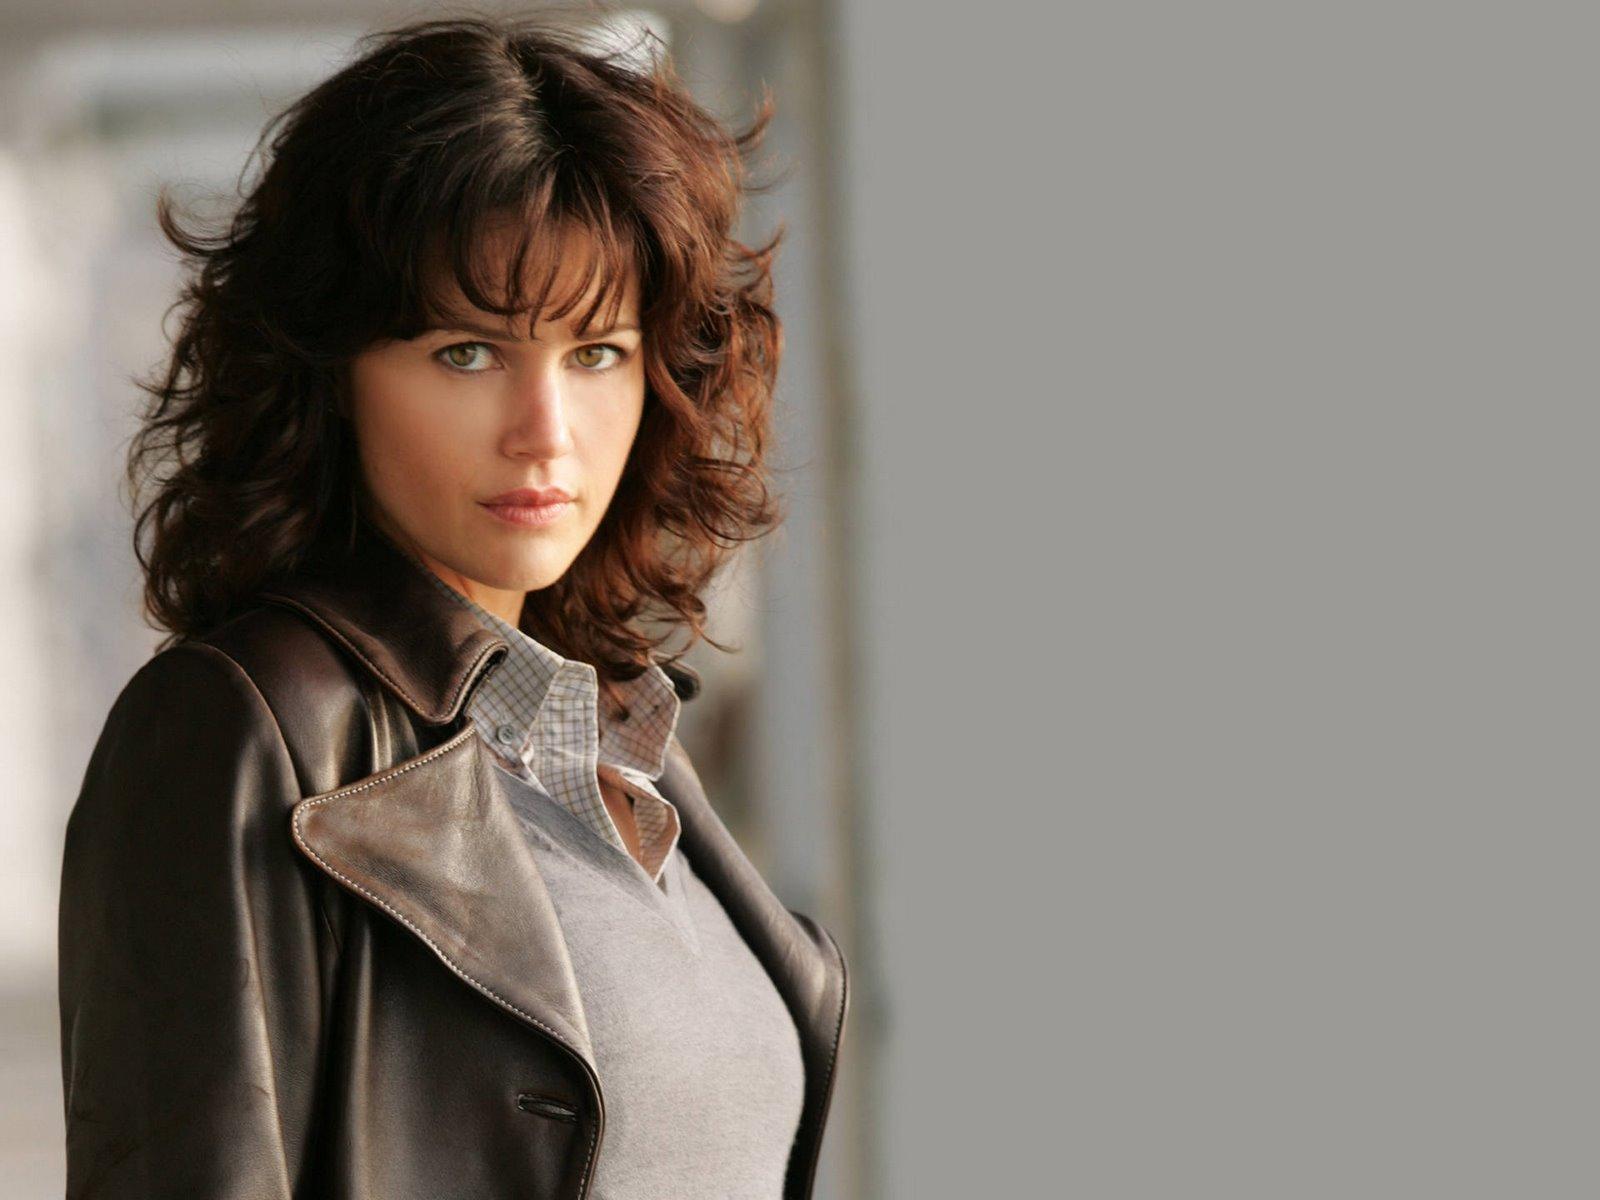 All Model and Movie Stars Photo Gallery: Carla Gugino Profile